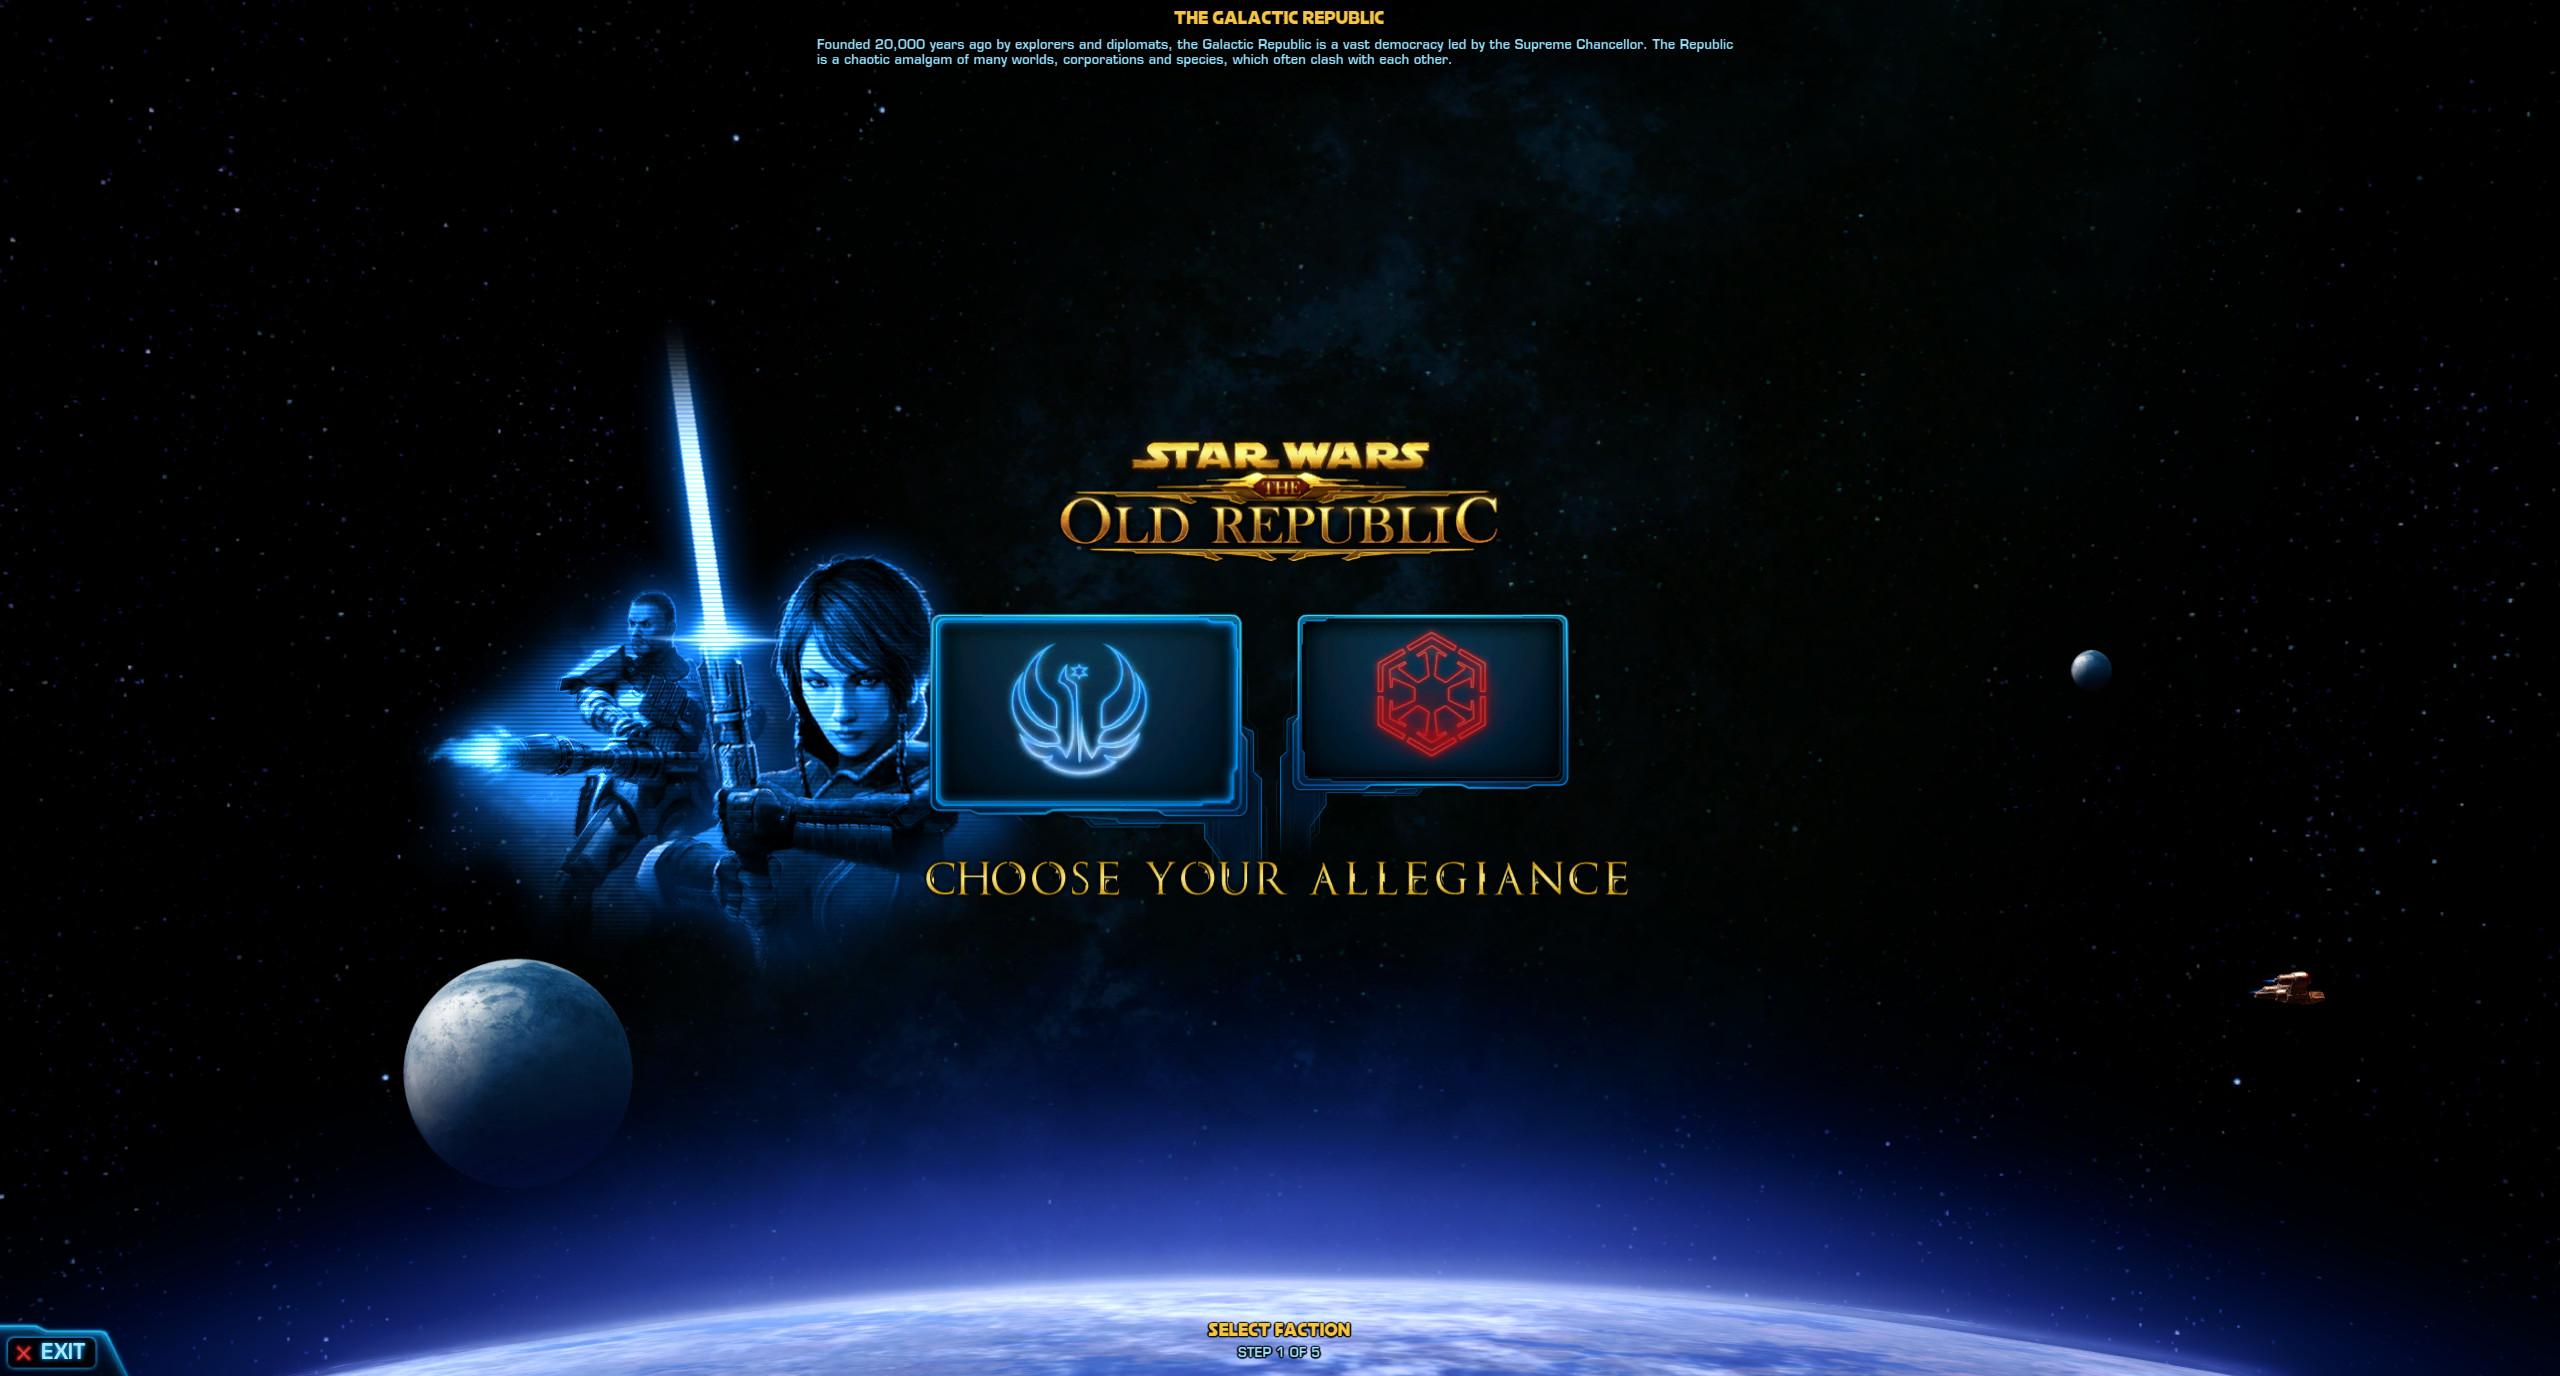 Choosing the Republic...